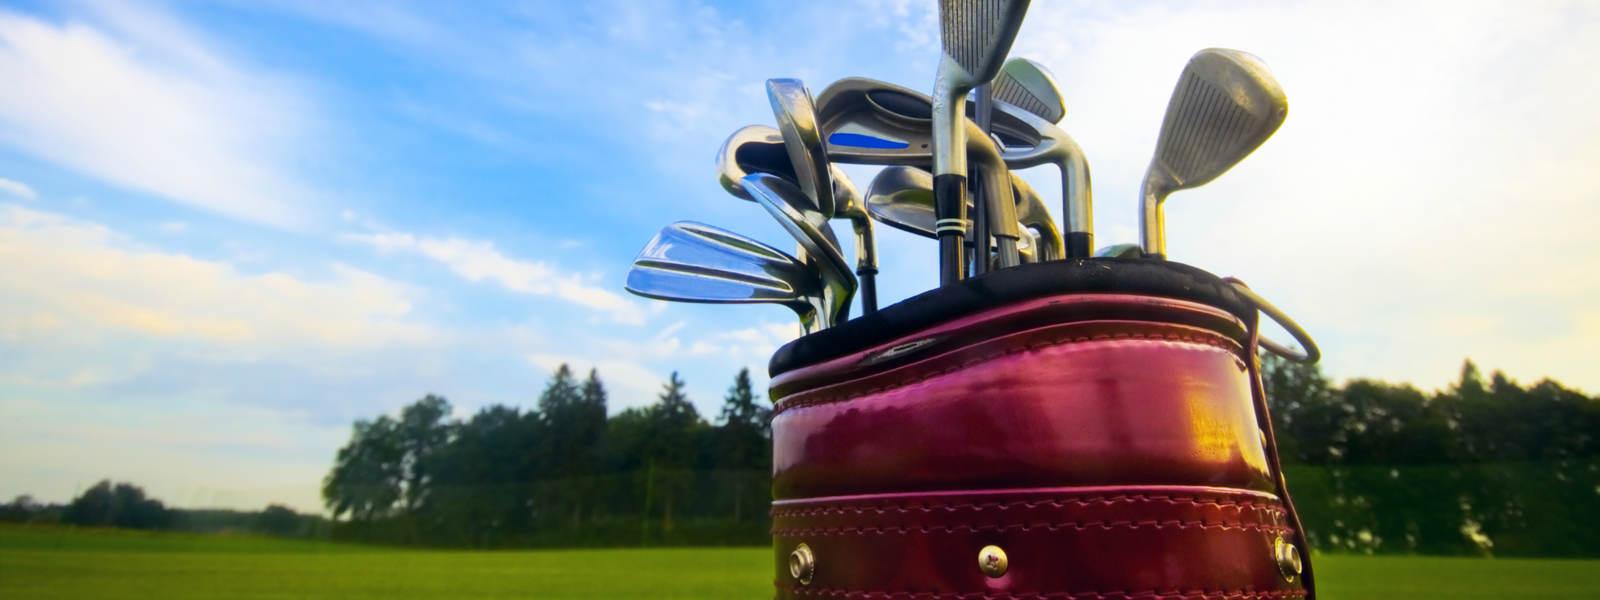 Golf clubs on a course in Edinburgh